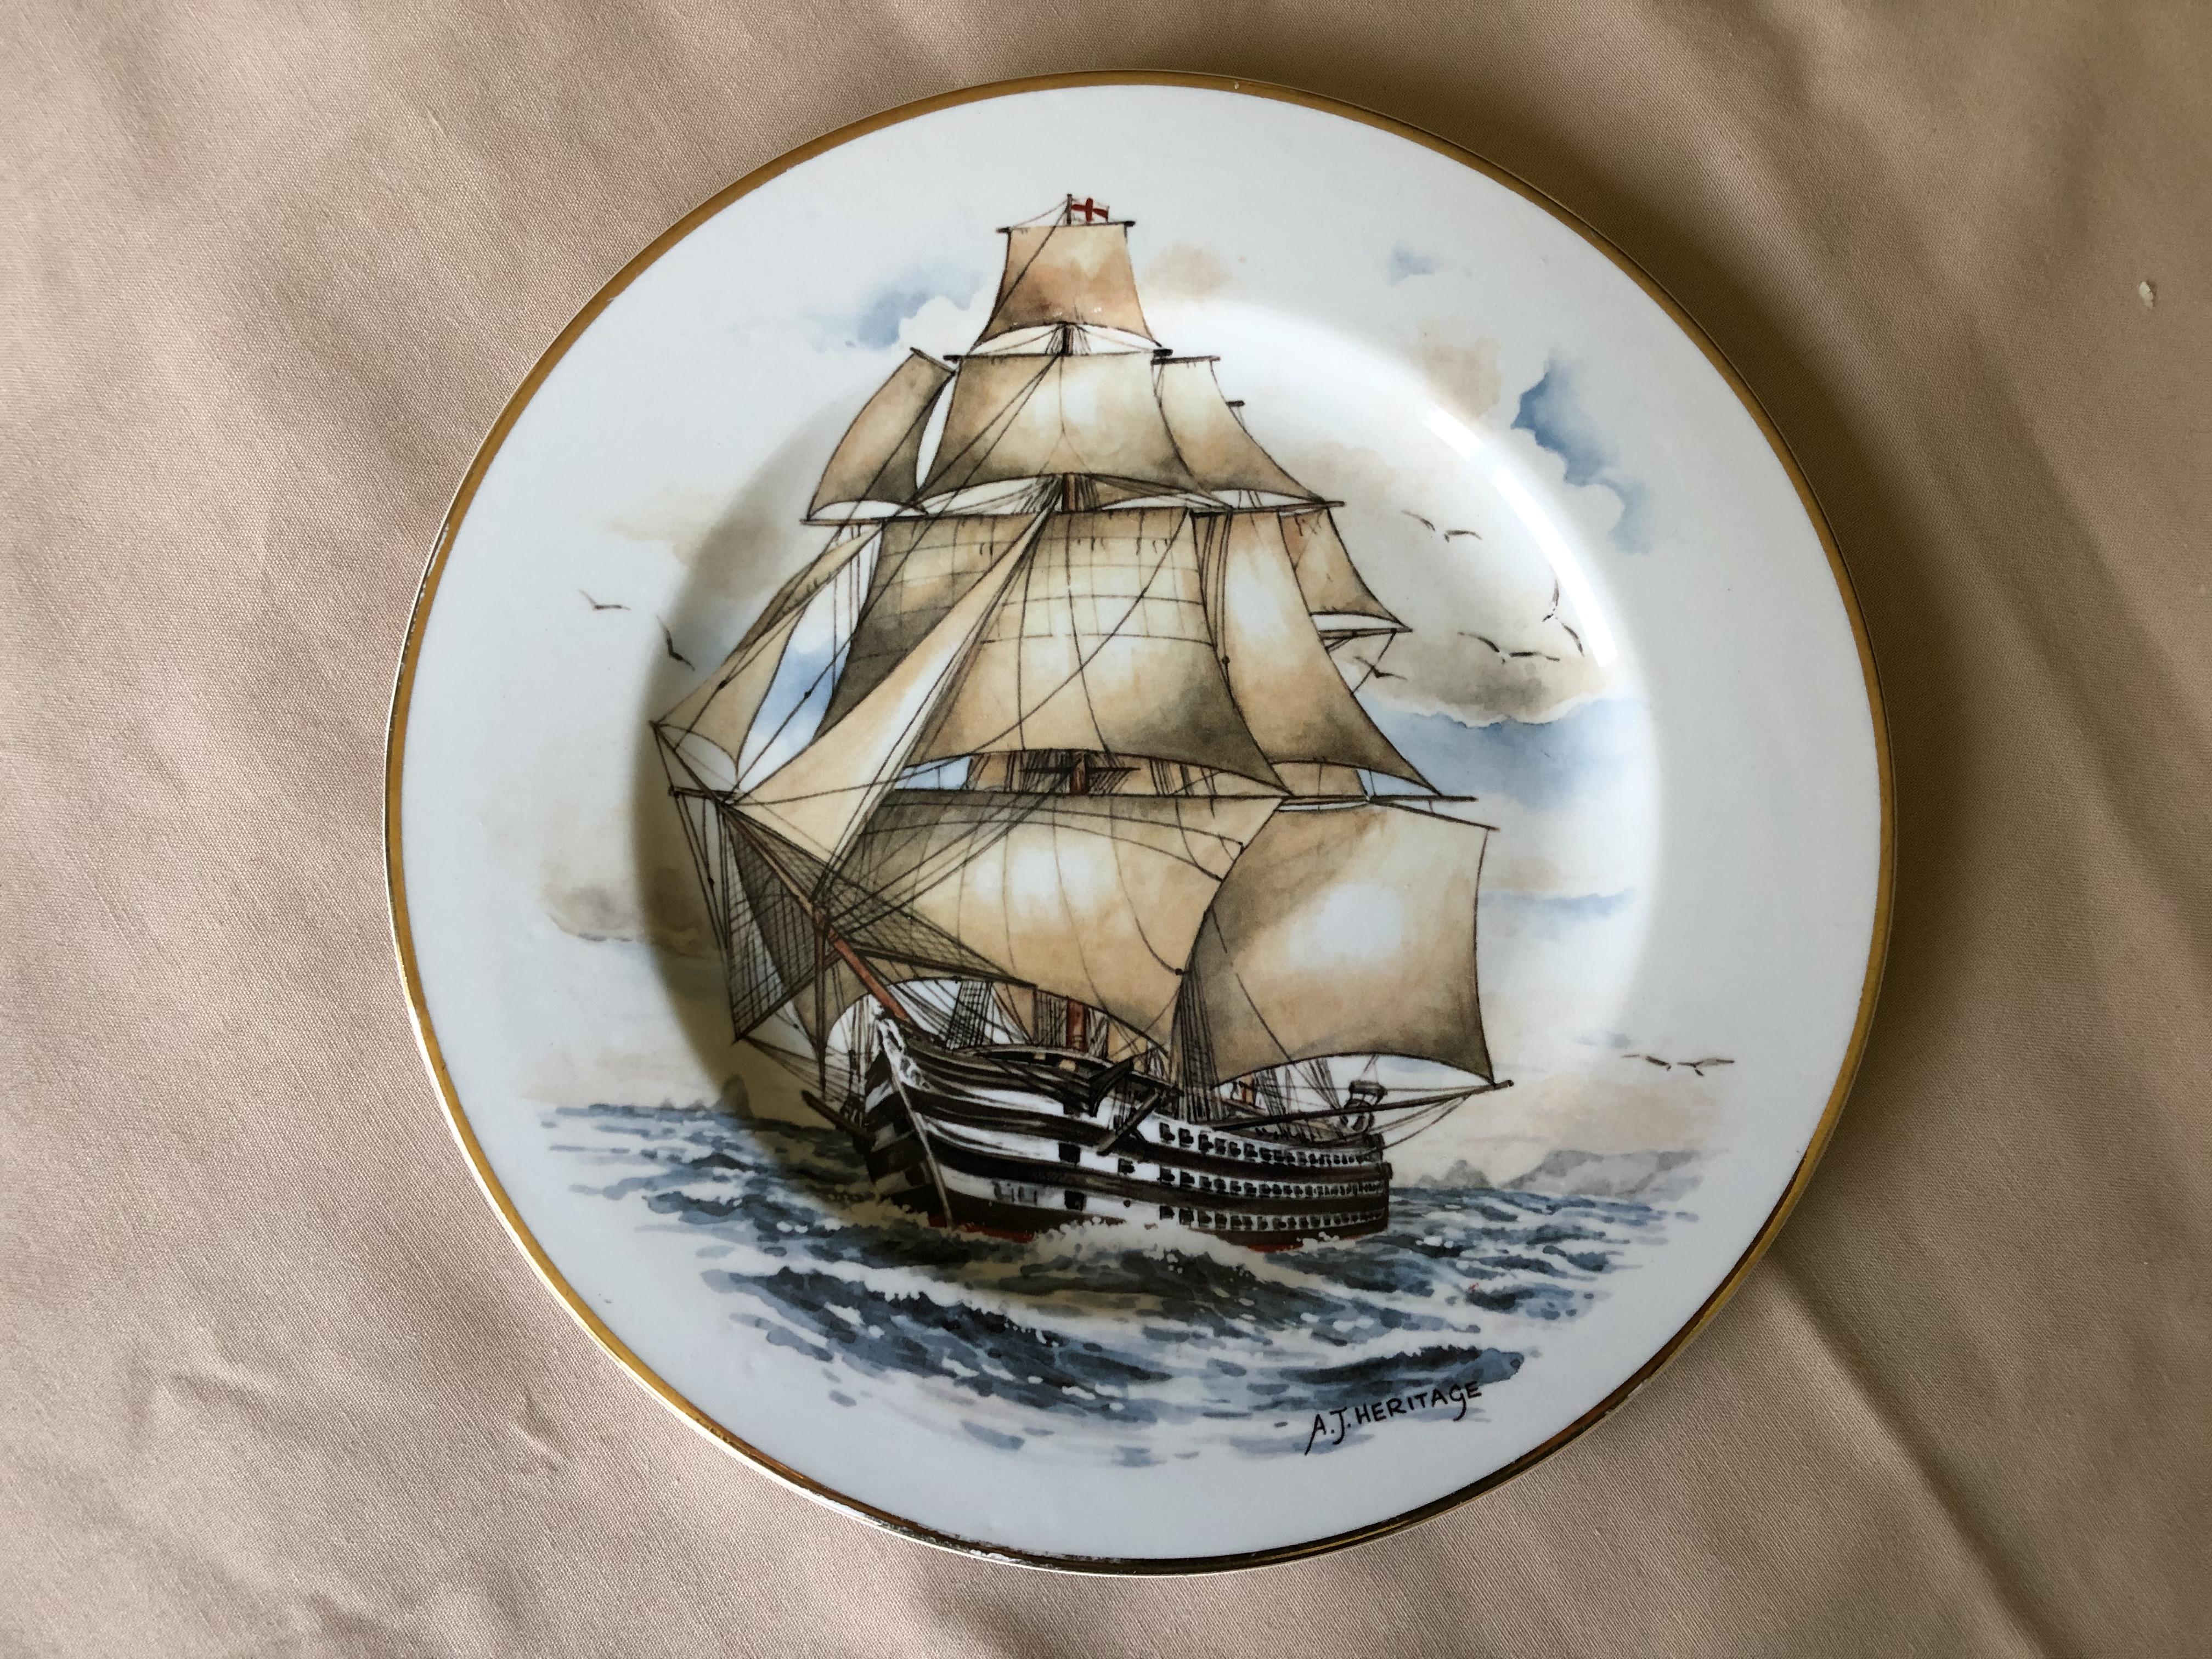 SOUVENIR PLATE OF THE WOODEN VESSEL HMS VICTORIA 1859